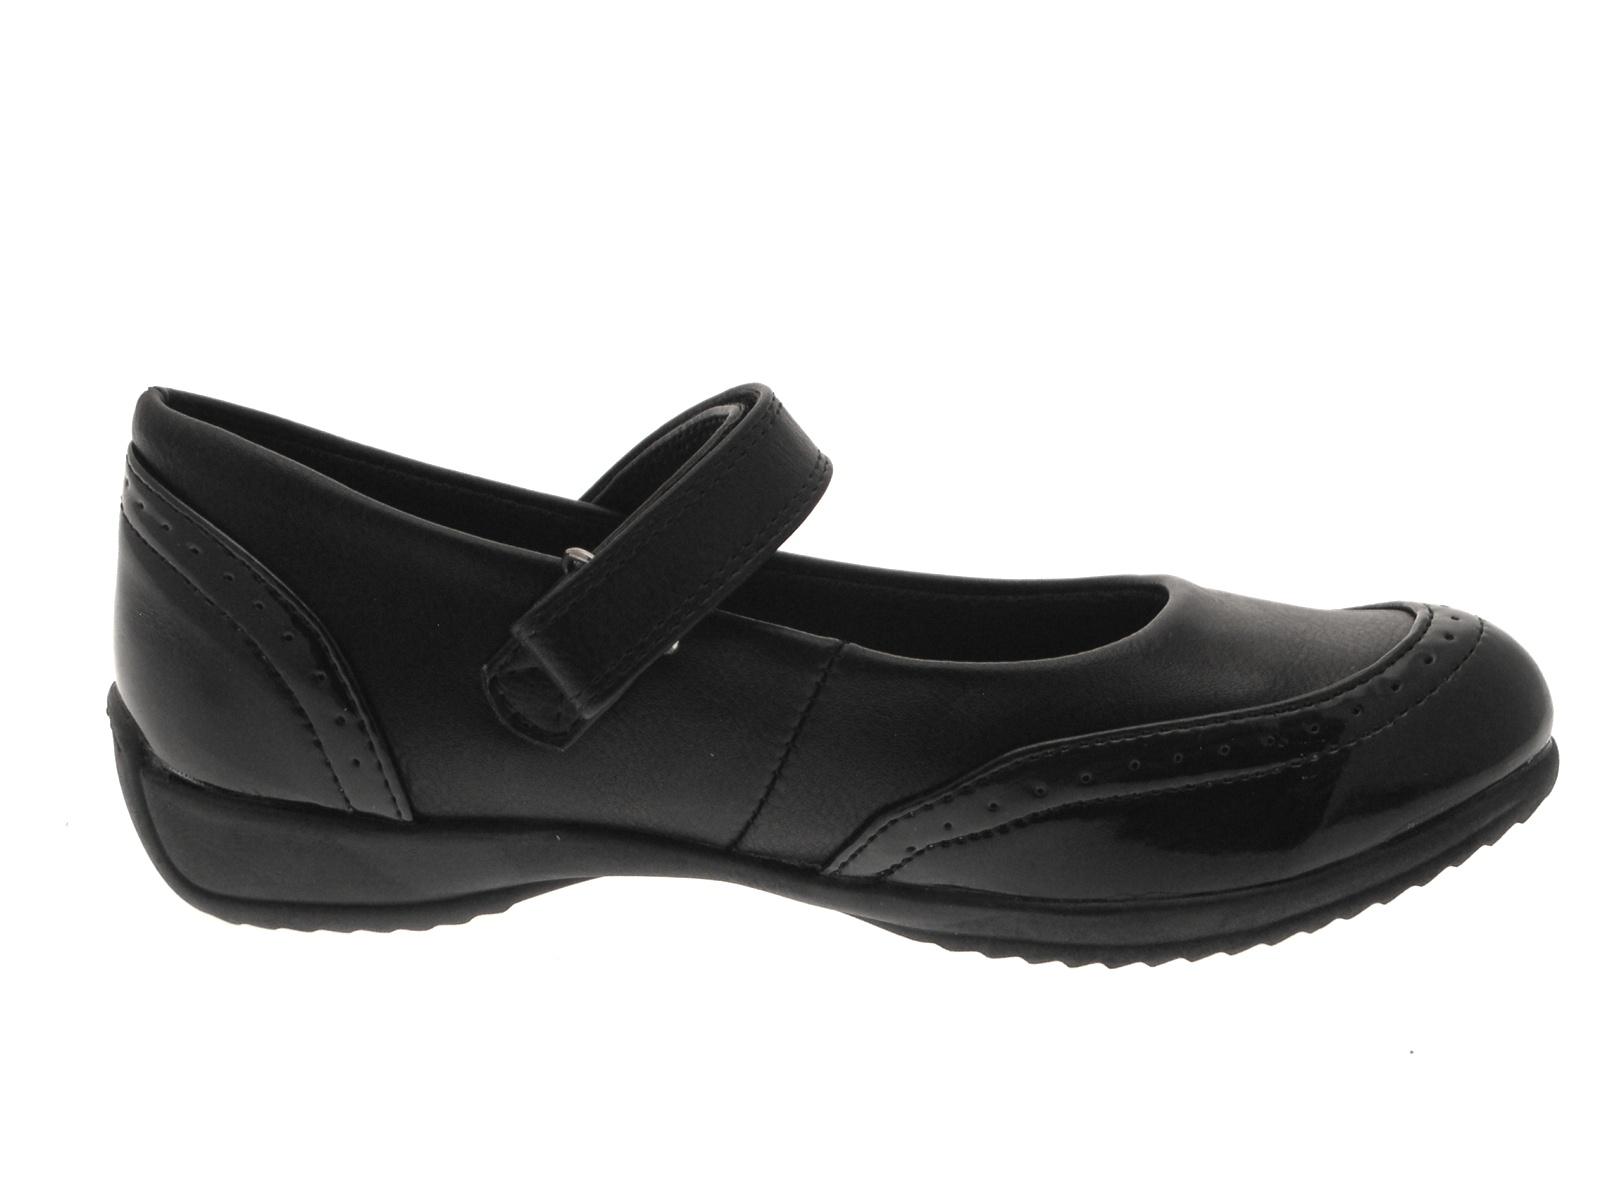 Girls Womens Kids Black Mary Jane School Work Shoes Brogues Junior Size UK 10-5 | EBay